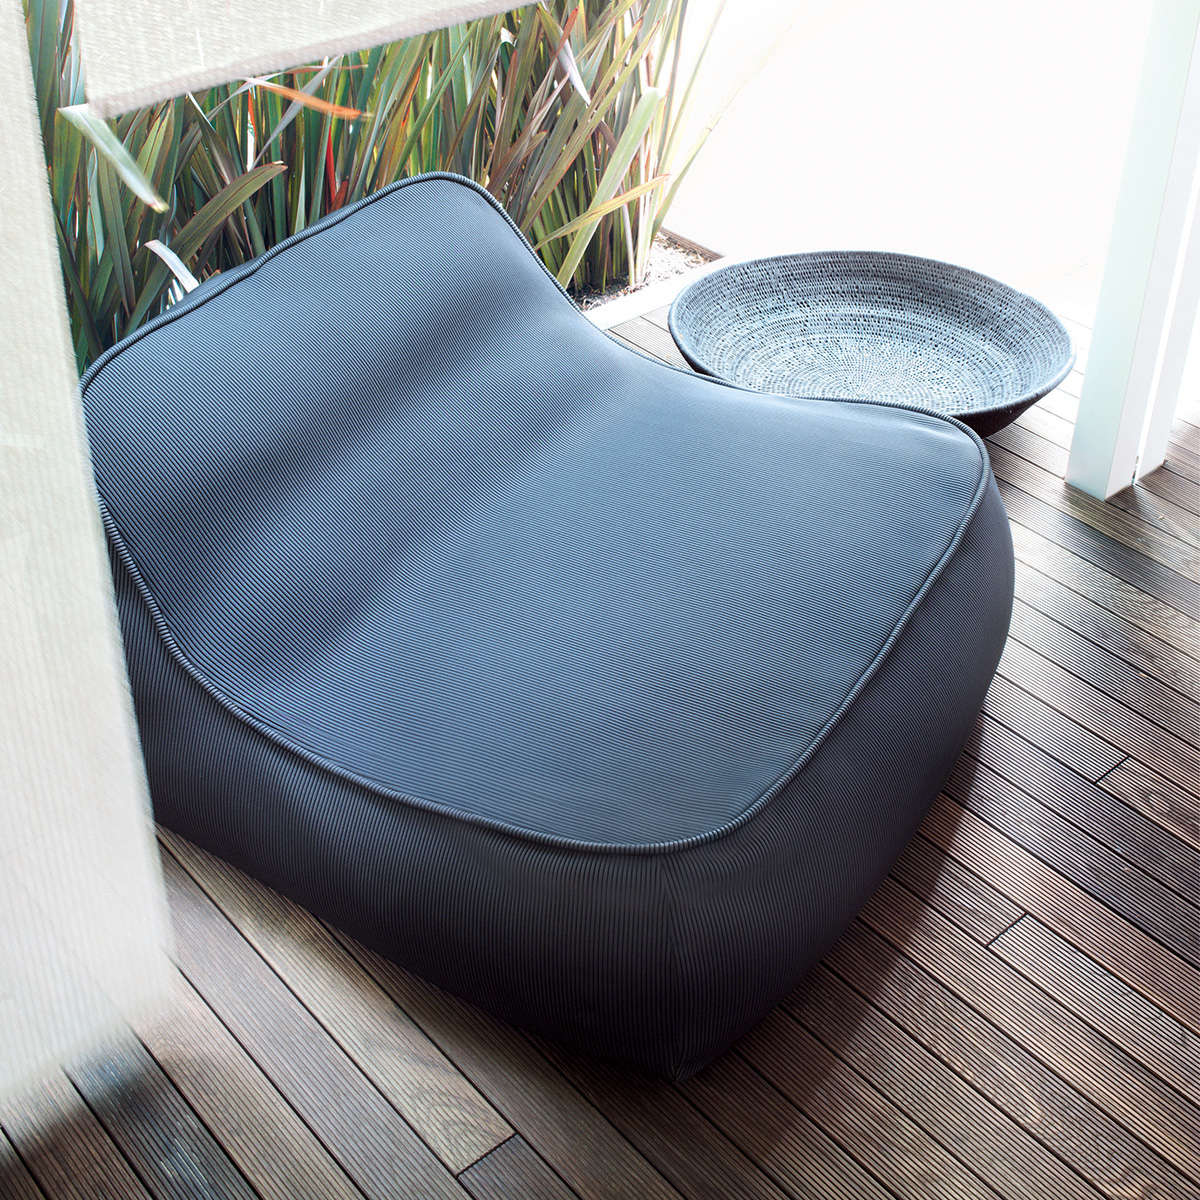 Float Paola Lenti Lounge Chair 3Jpg